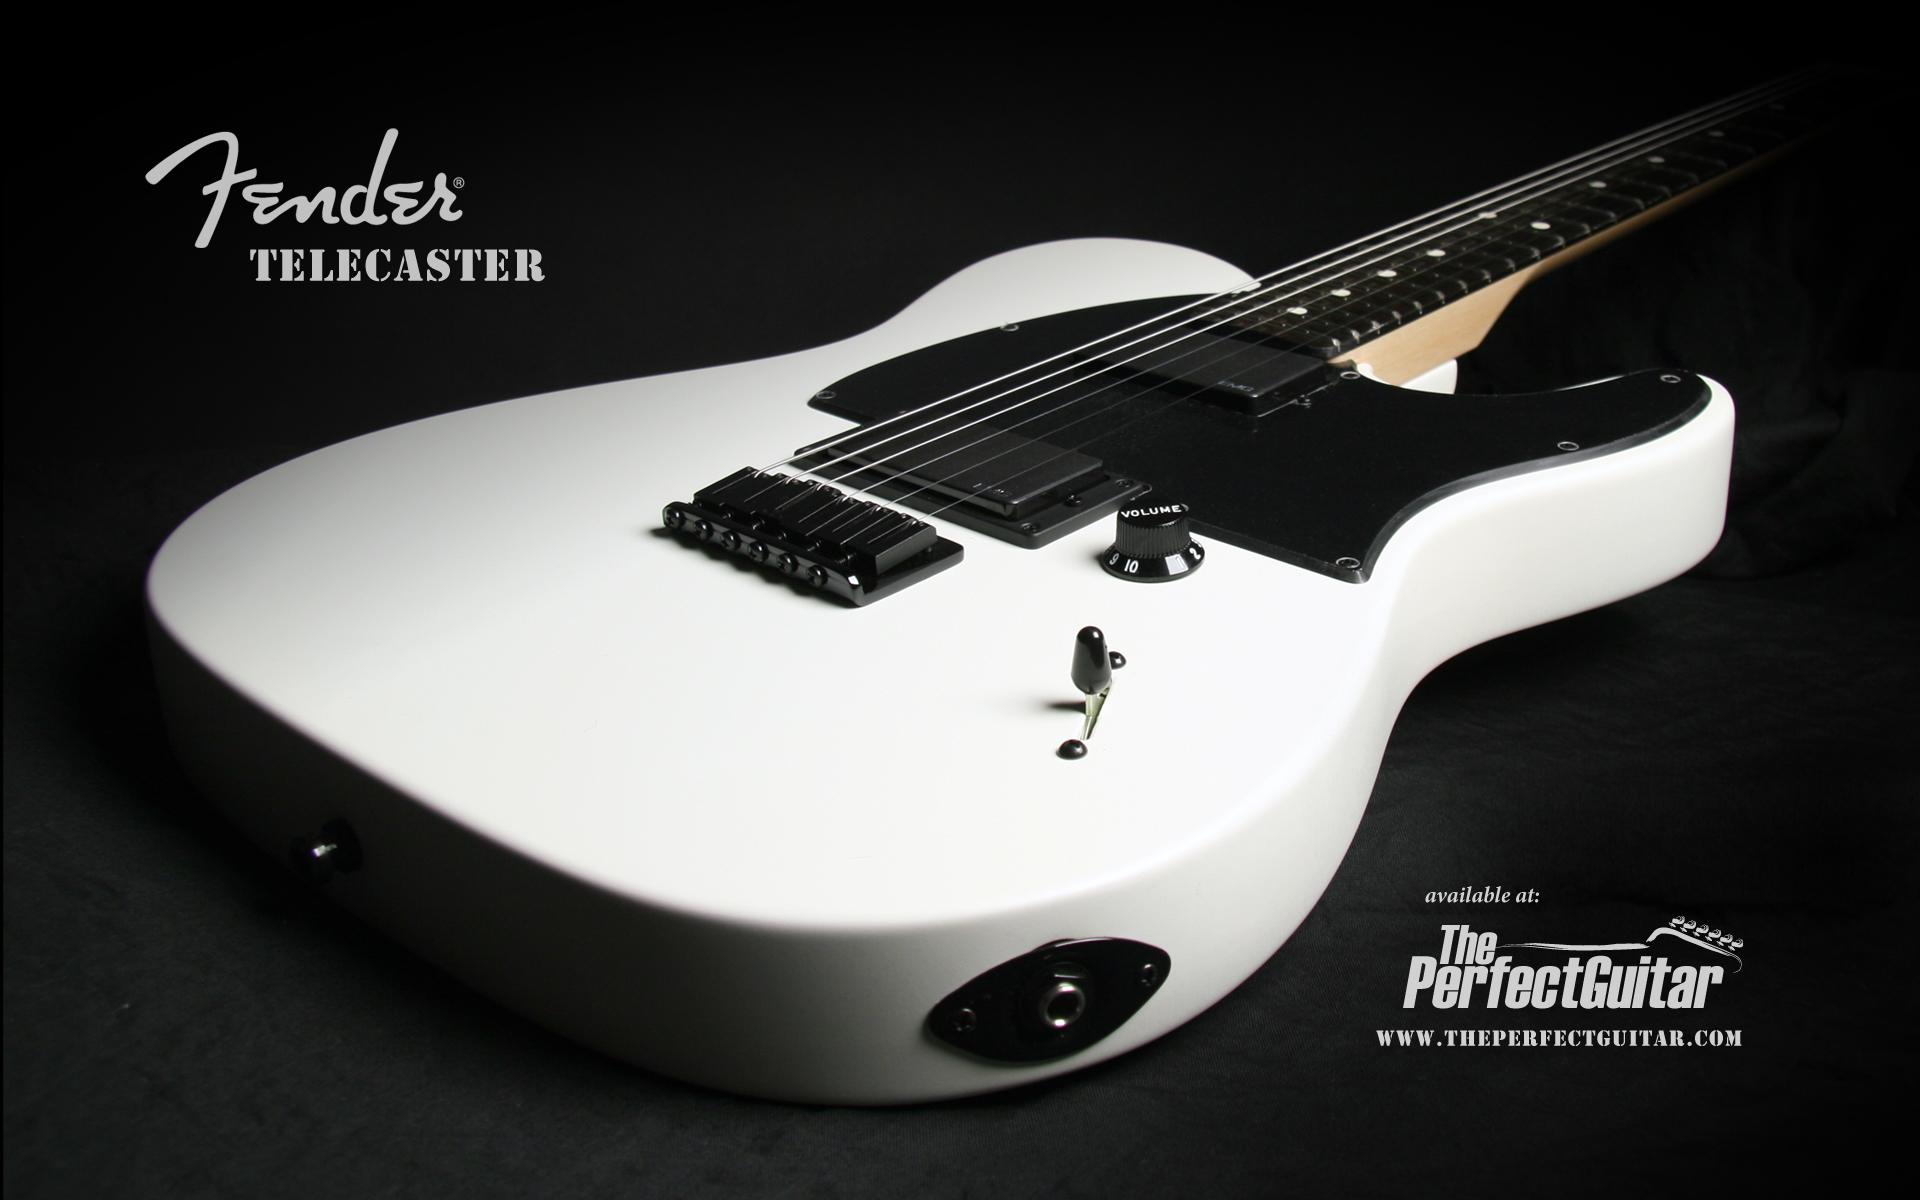 Wallpapers de guitarras Fender   Taringa 1920x1200